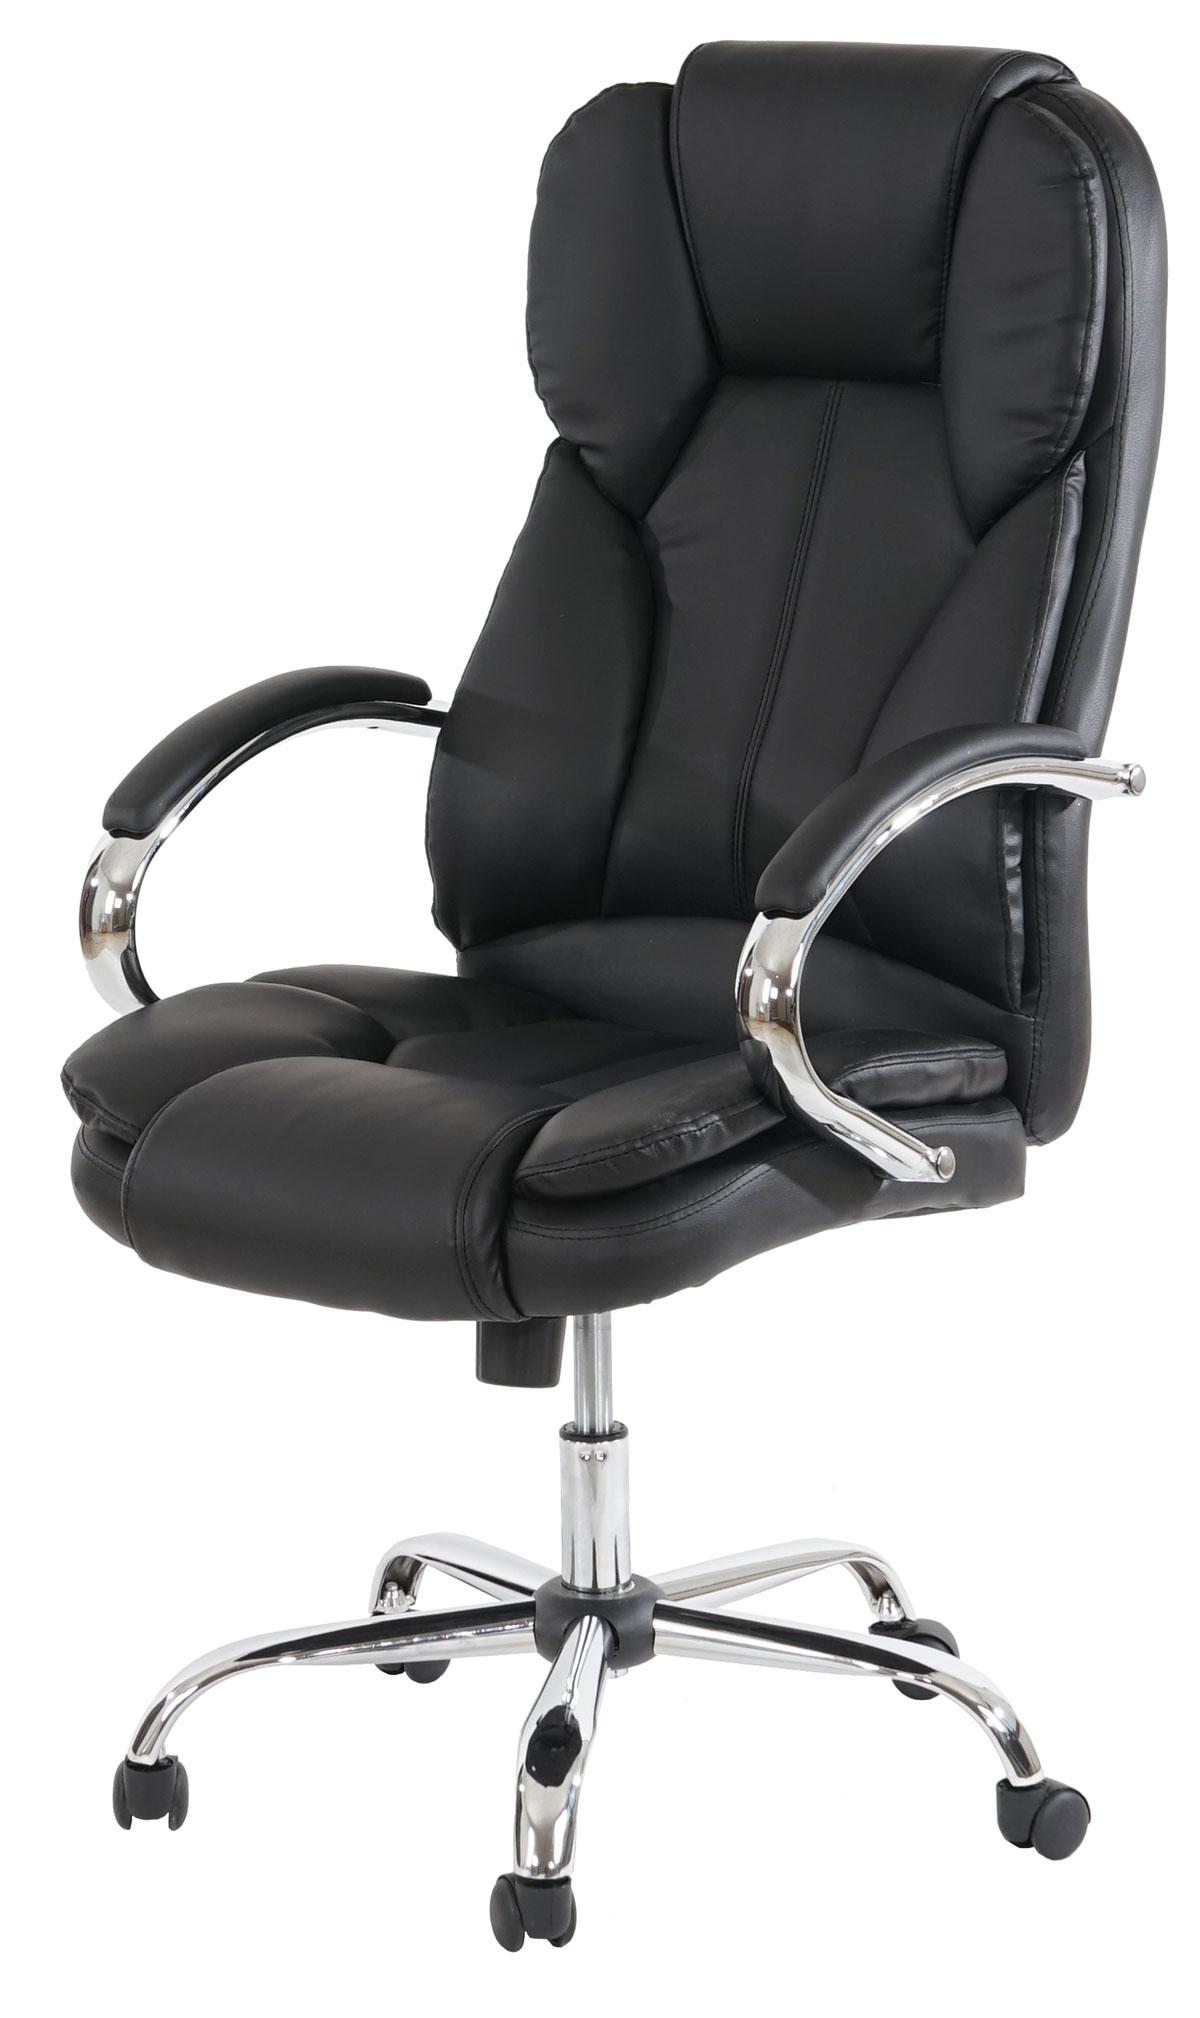 Profi-Bürostuhl Kansas XXL Chefsessel Drehstuhl US-Version, 150kg belastbar, Kunstleder ~ Variantena